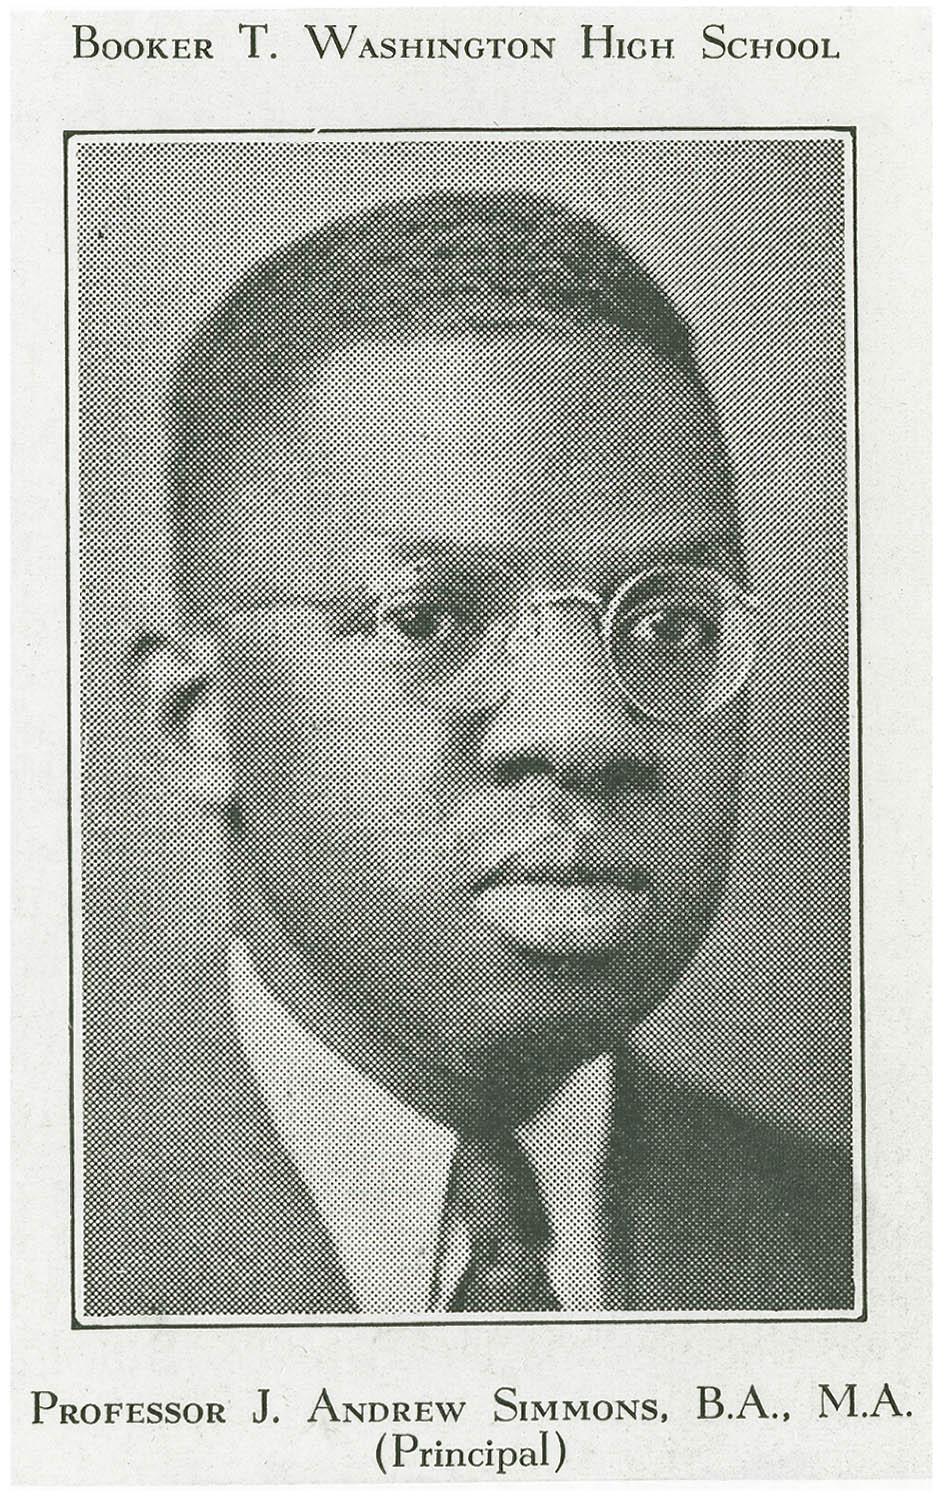 Portrait of Avery Alumnus and Teacher, Professor J. Andrew Simmons